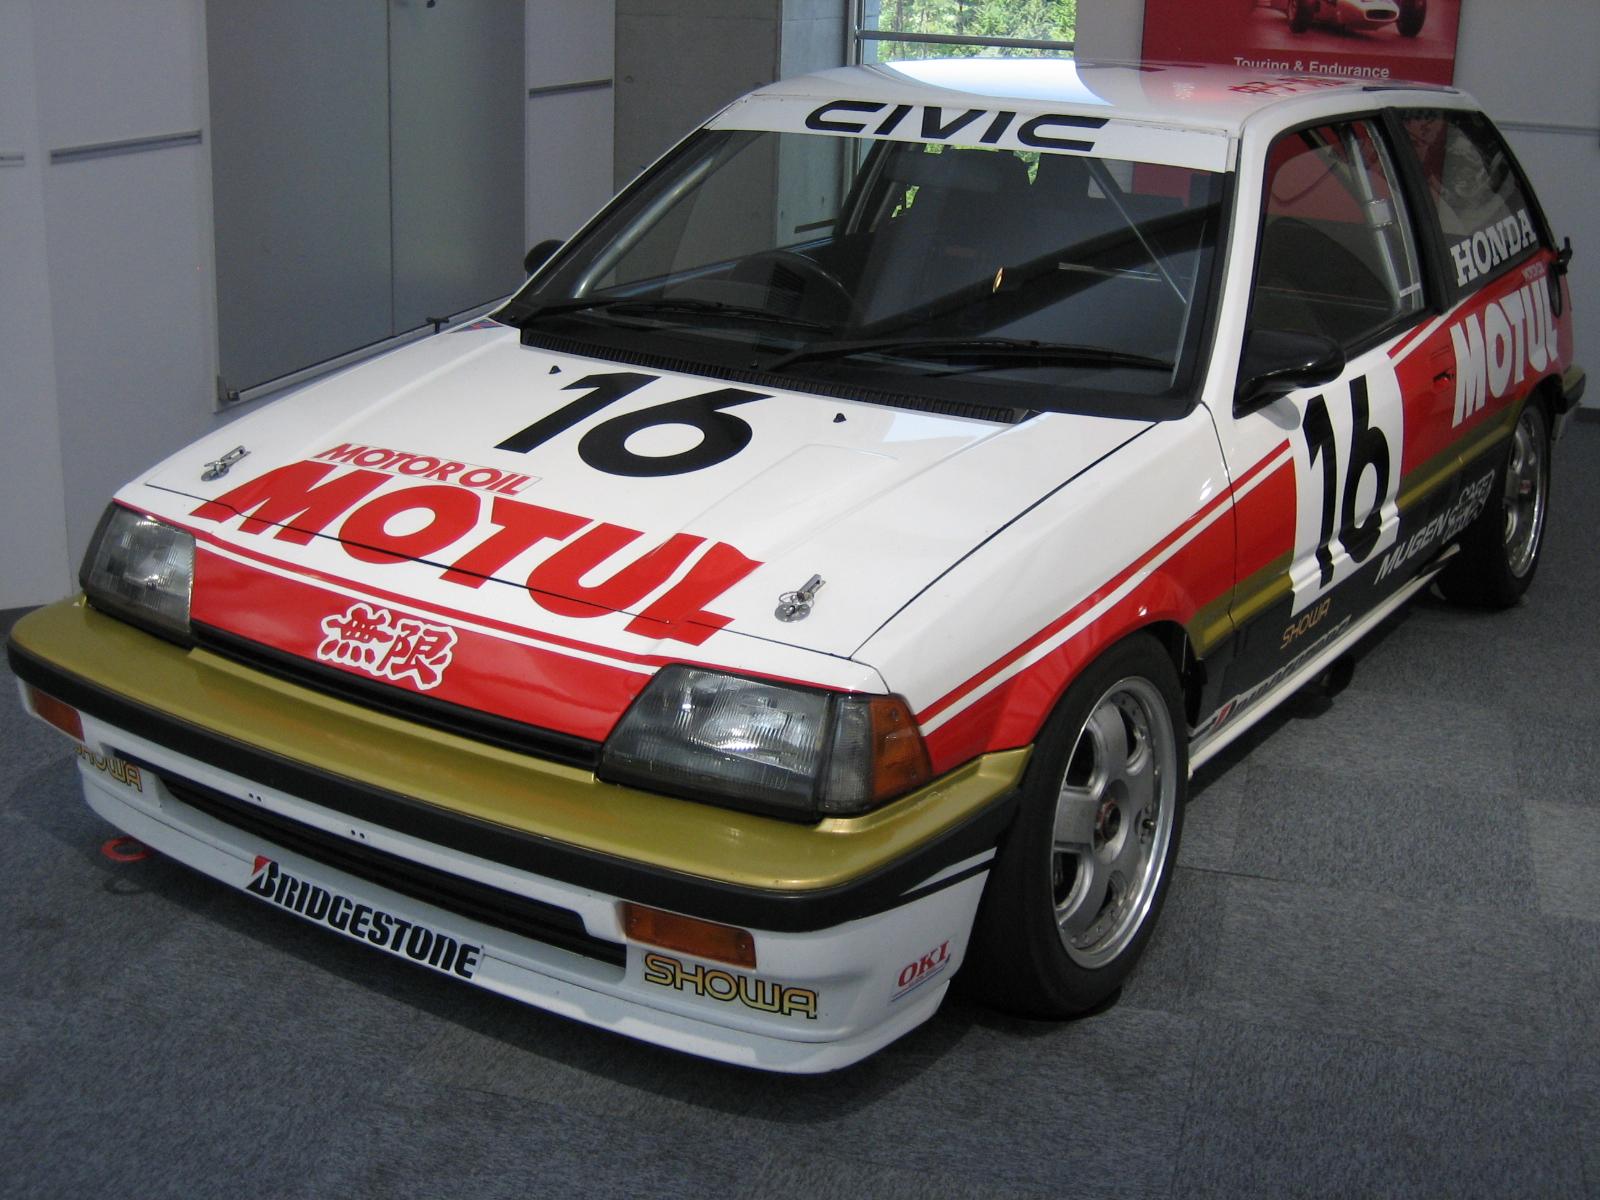 File:Mugen MOTUL CIVIC Si Racecar..JPG